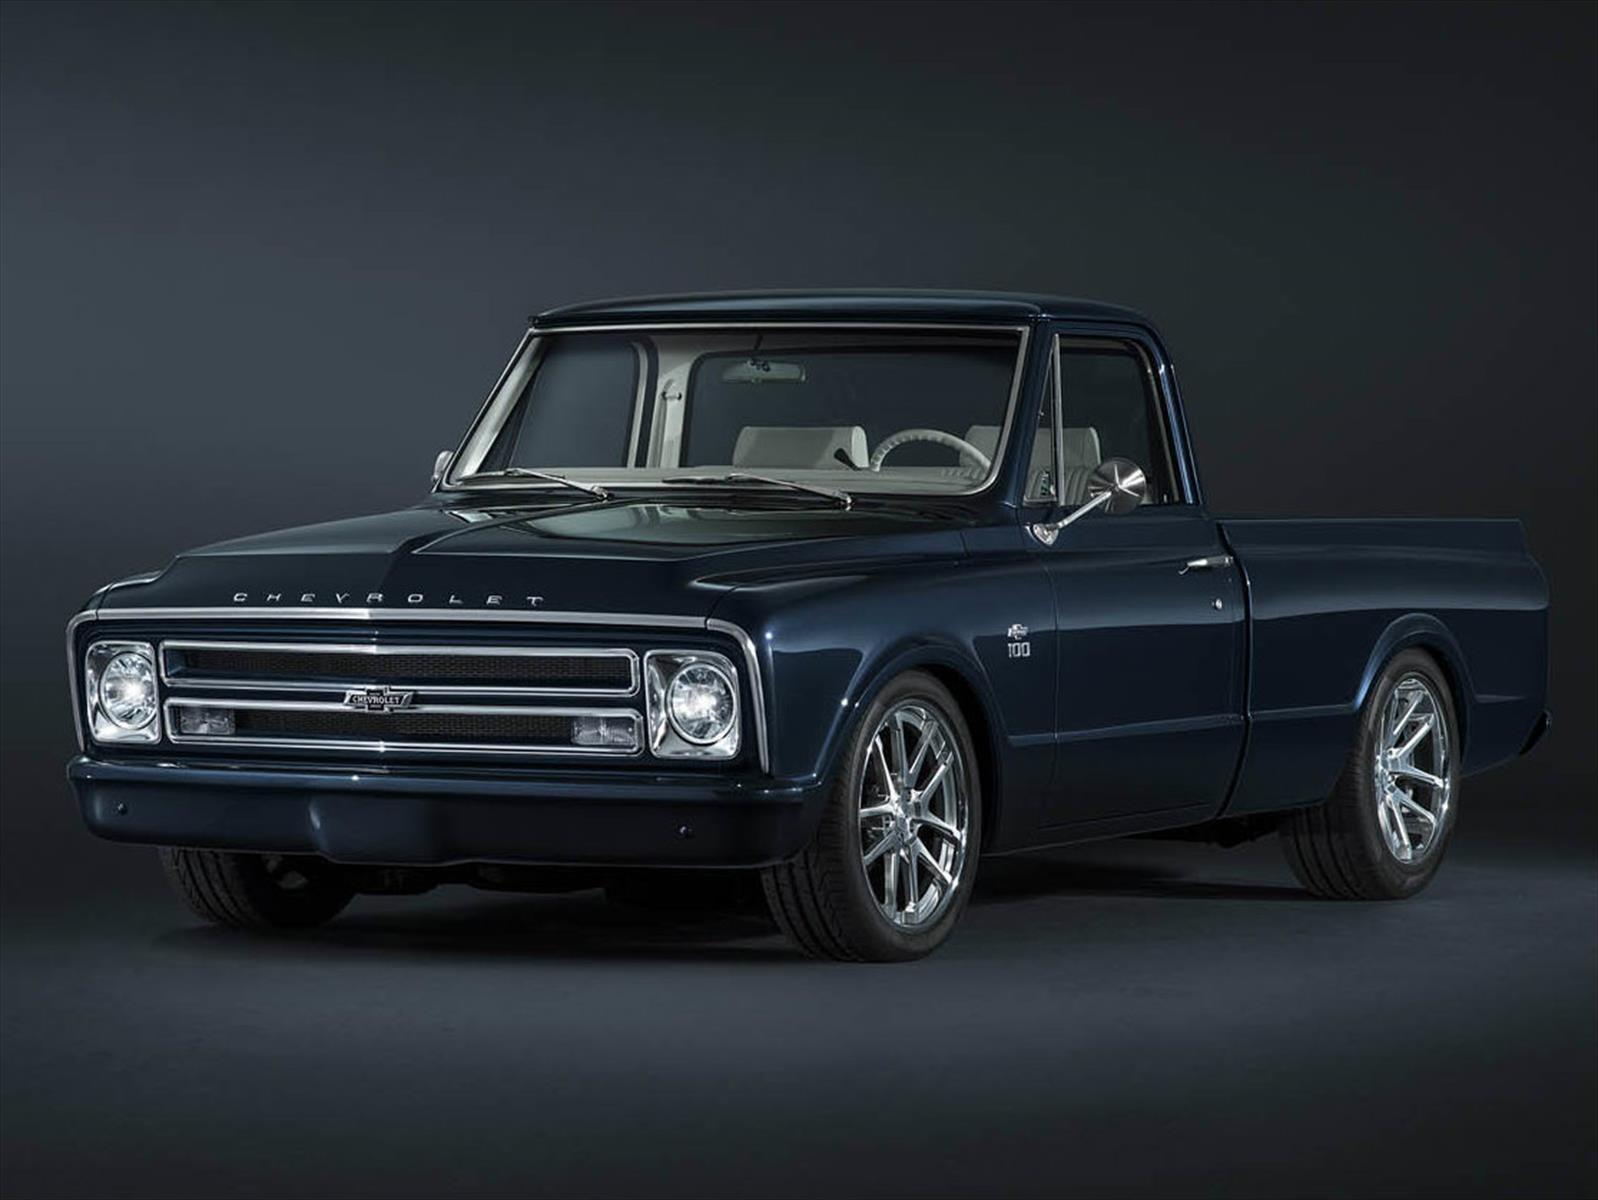 Chevrolet C-10 1967, celebra un Centenario de pickups